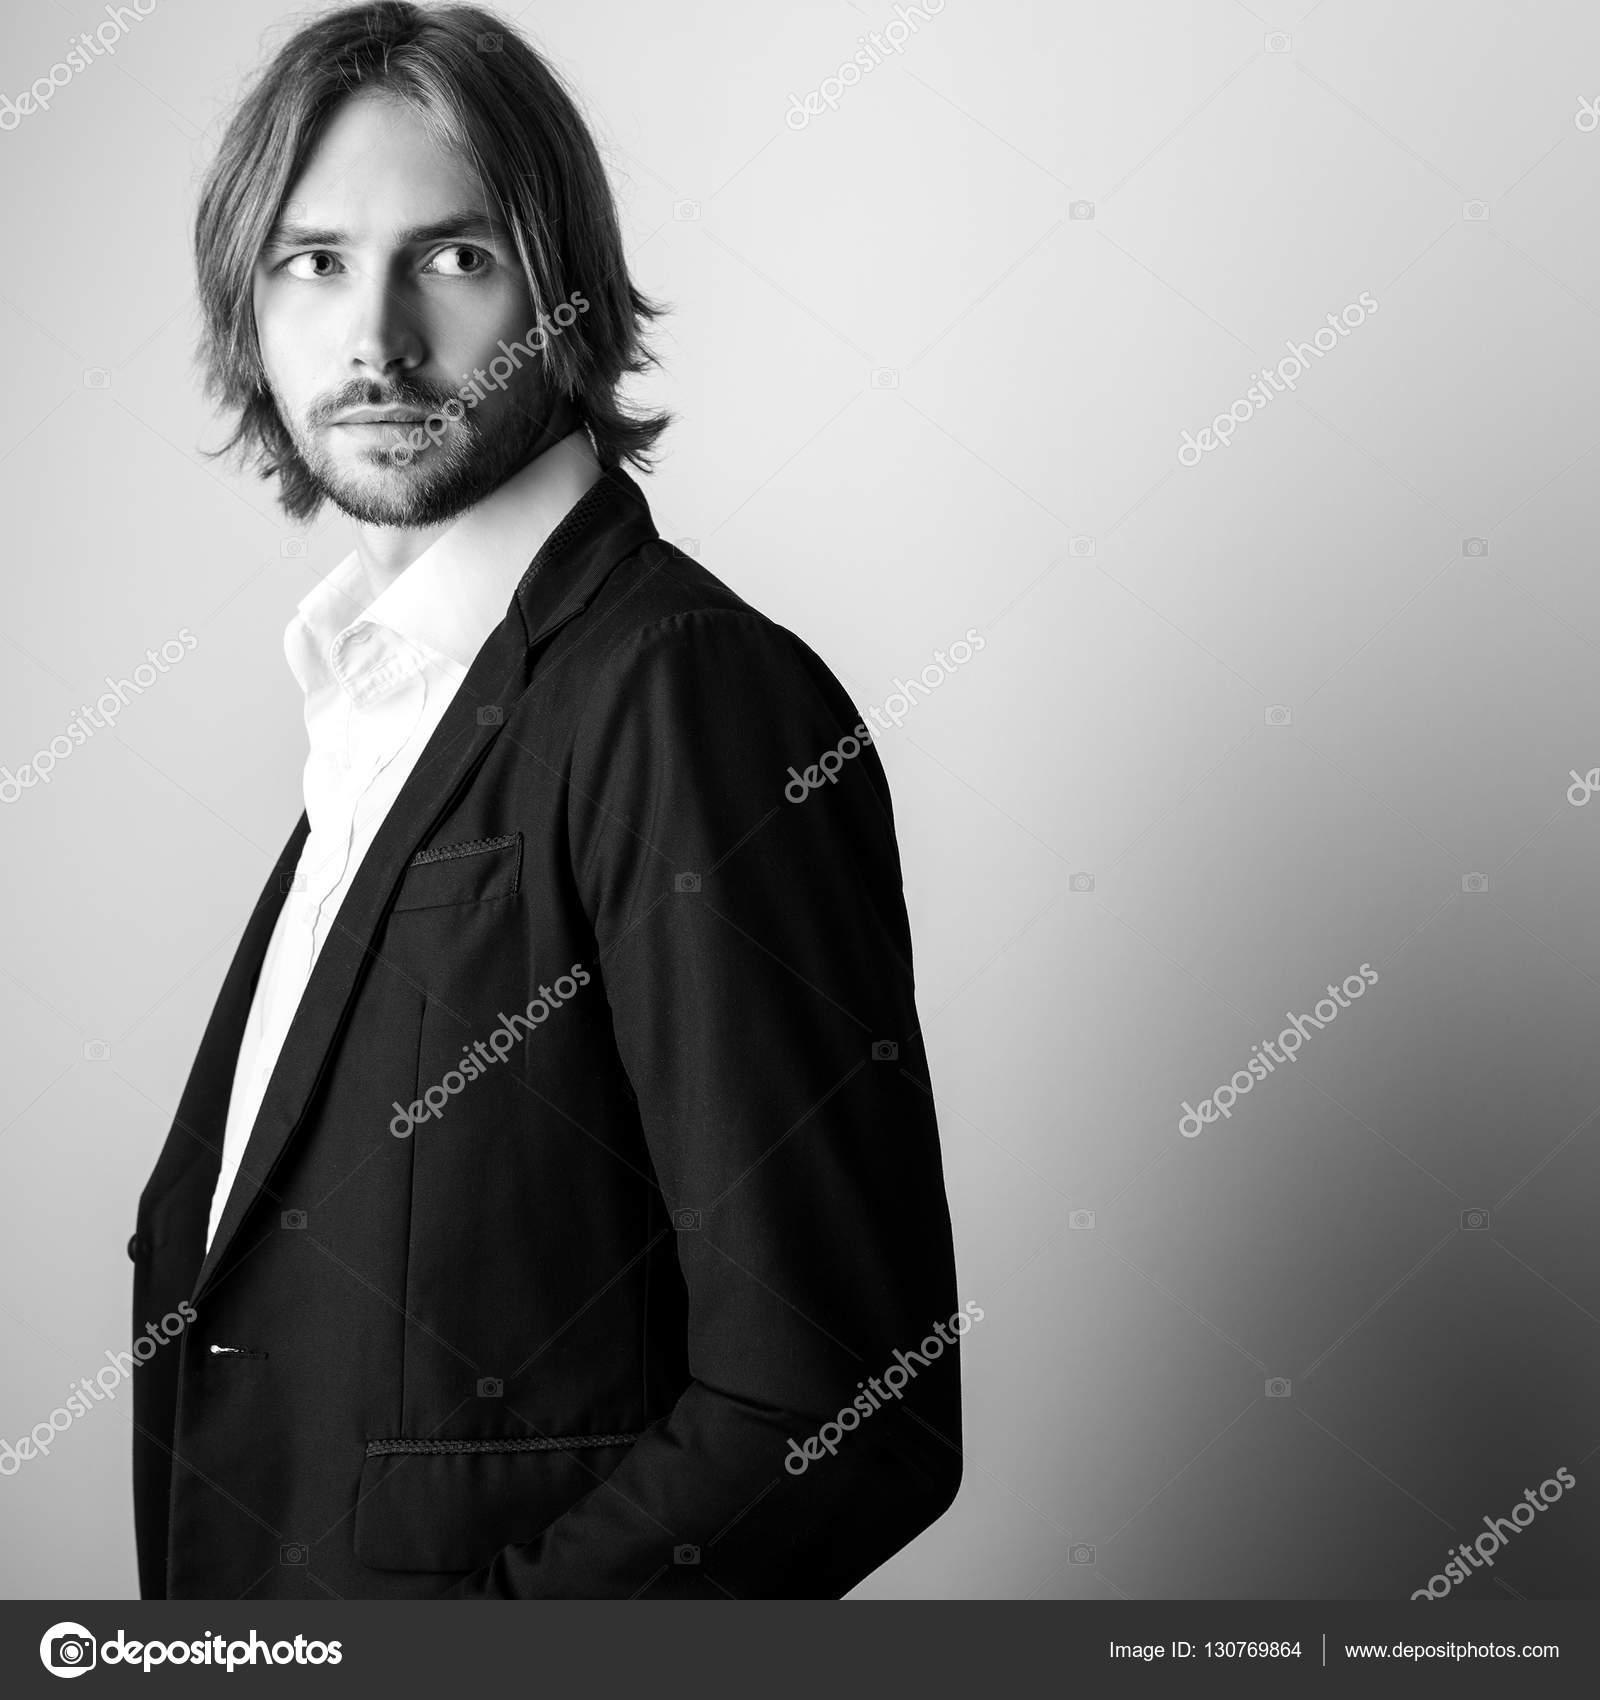 Cheveux long blanc homme